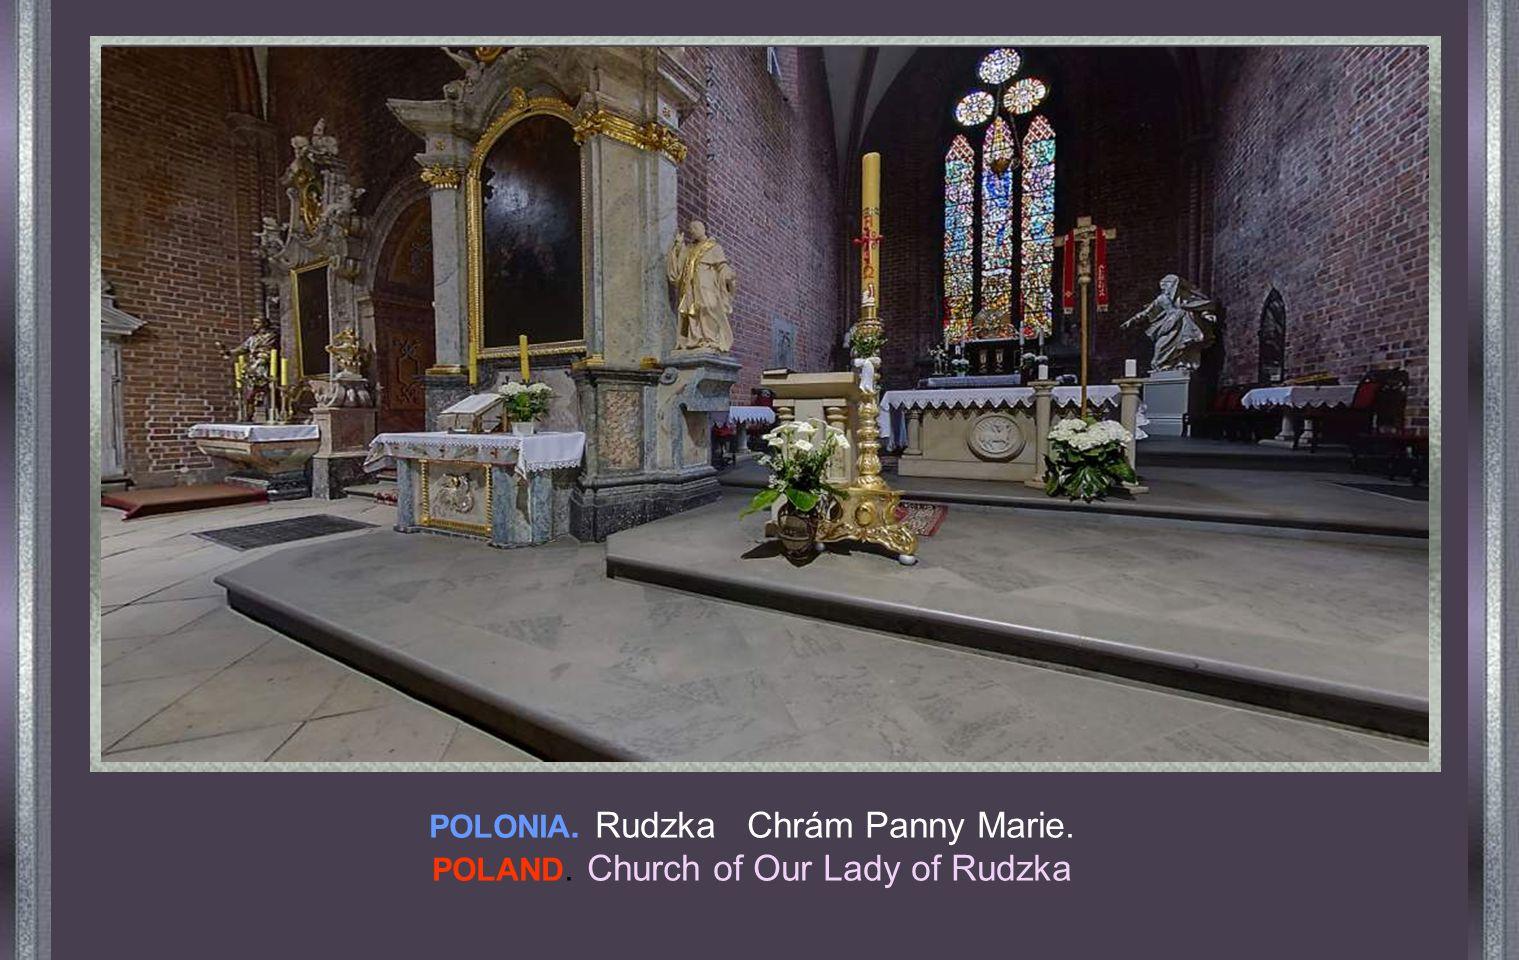 POLONIA. Farní kostel sv. Terezie. POLAND. Parish Church of Santa Teresa